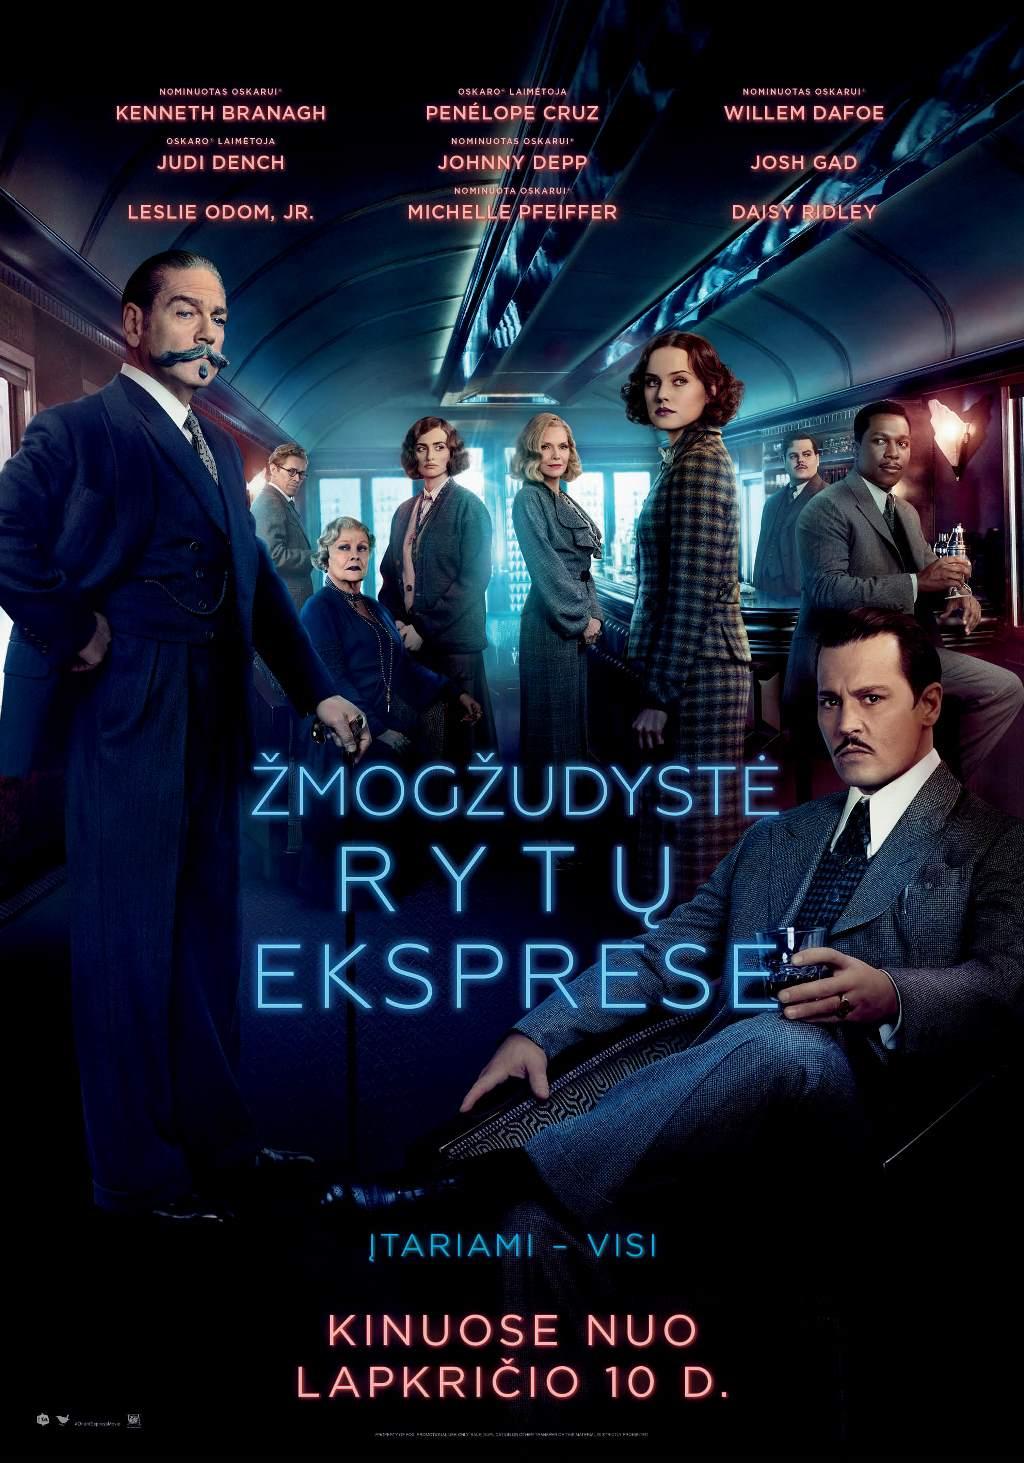 Žmogžudystė Rytų eksprese (Murder on the Orient Express)